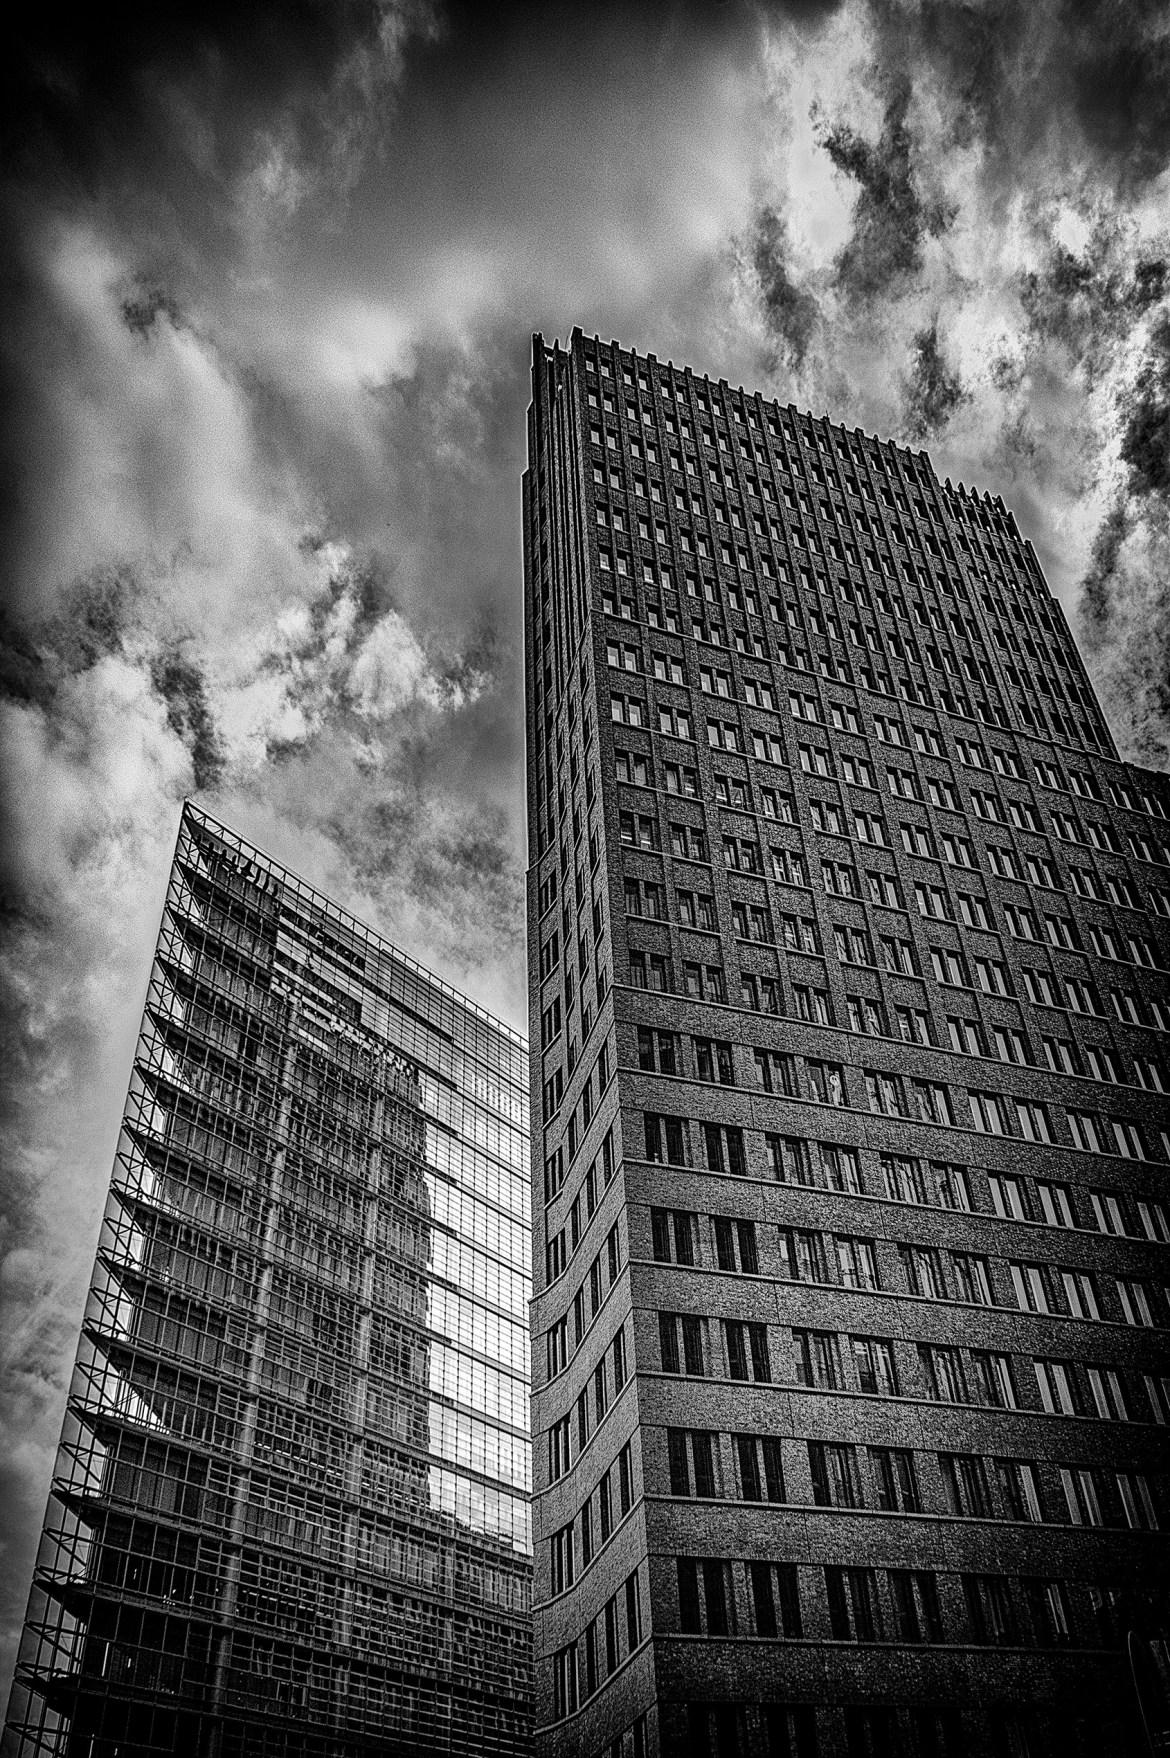 2017-09-11-Berlin-L1007956_LFI by Roger Schäfer.